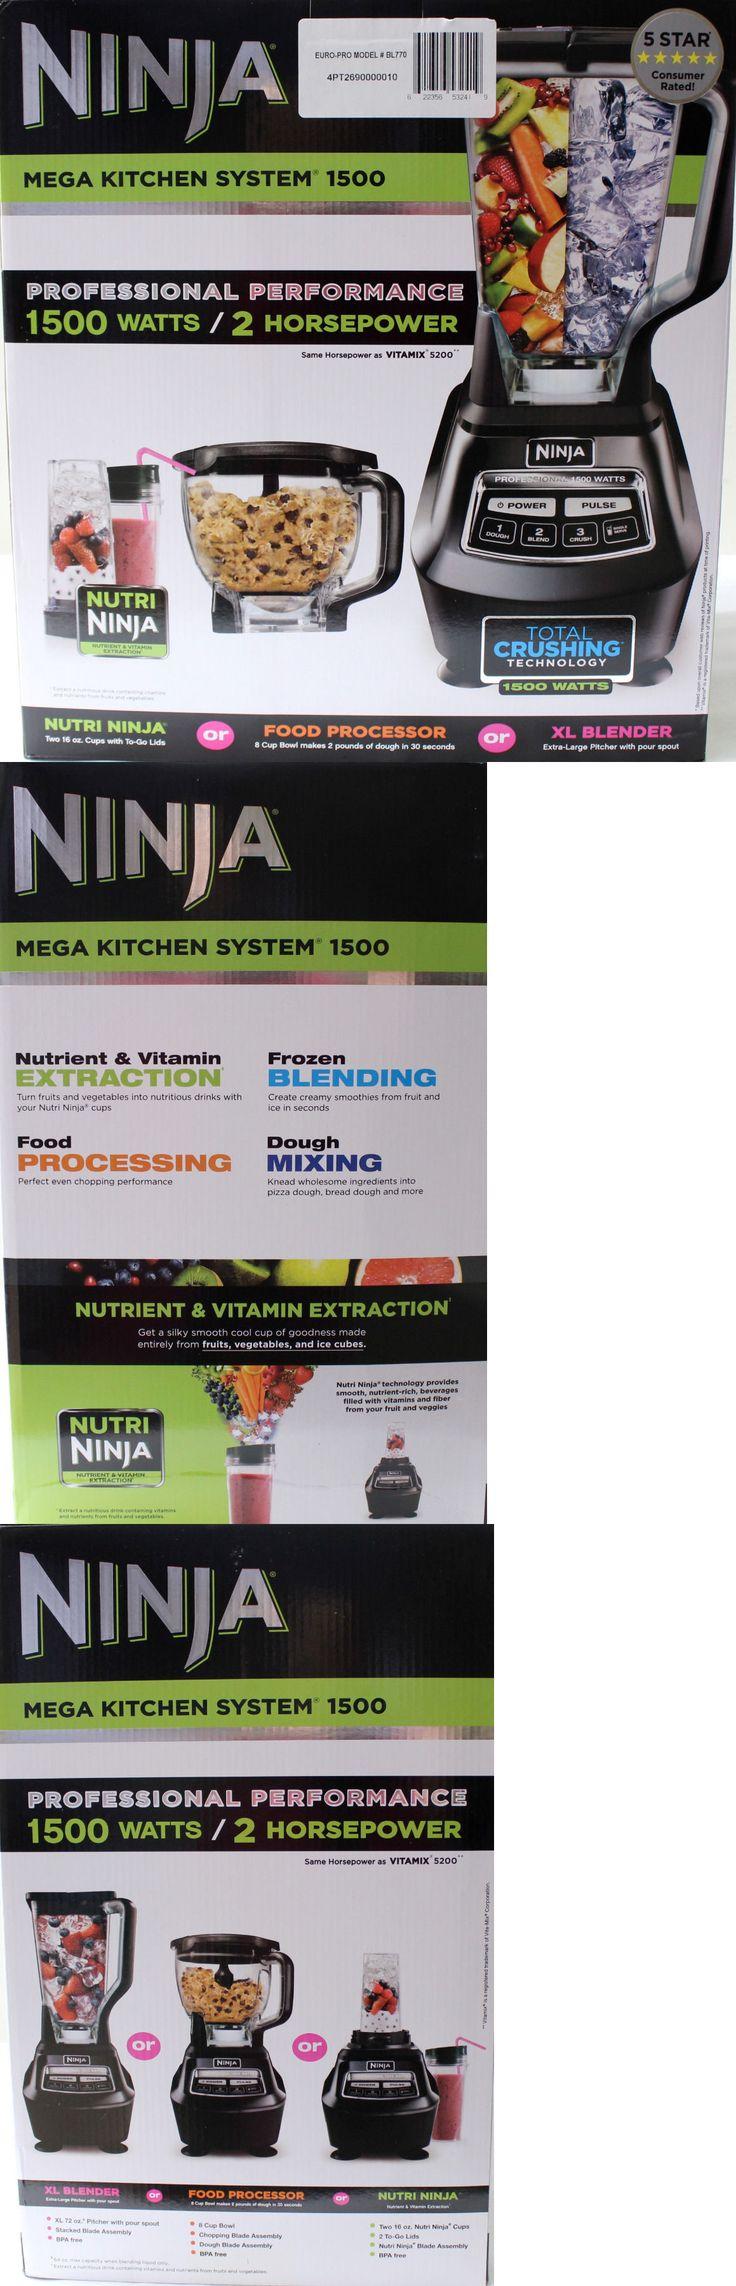 Food Processors 20673: Ninja Mega Kitchen System Bl770 Blender Food Processor Mixer 1500 Watt New -> BUY IT NOW ONLY: $159.99 on eBay!